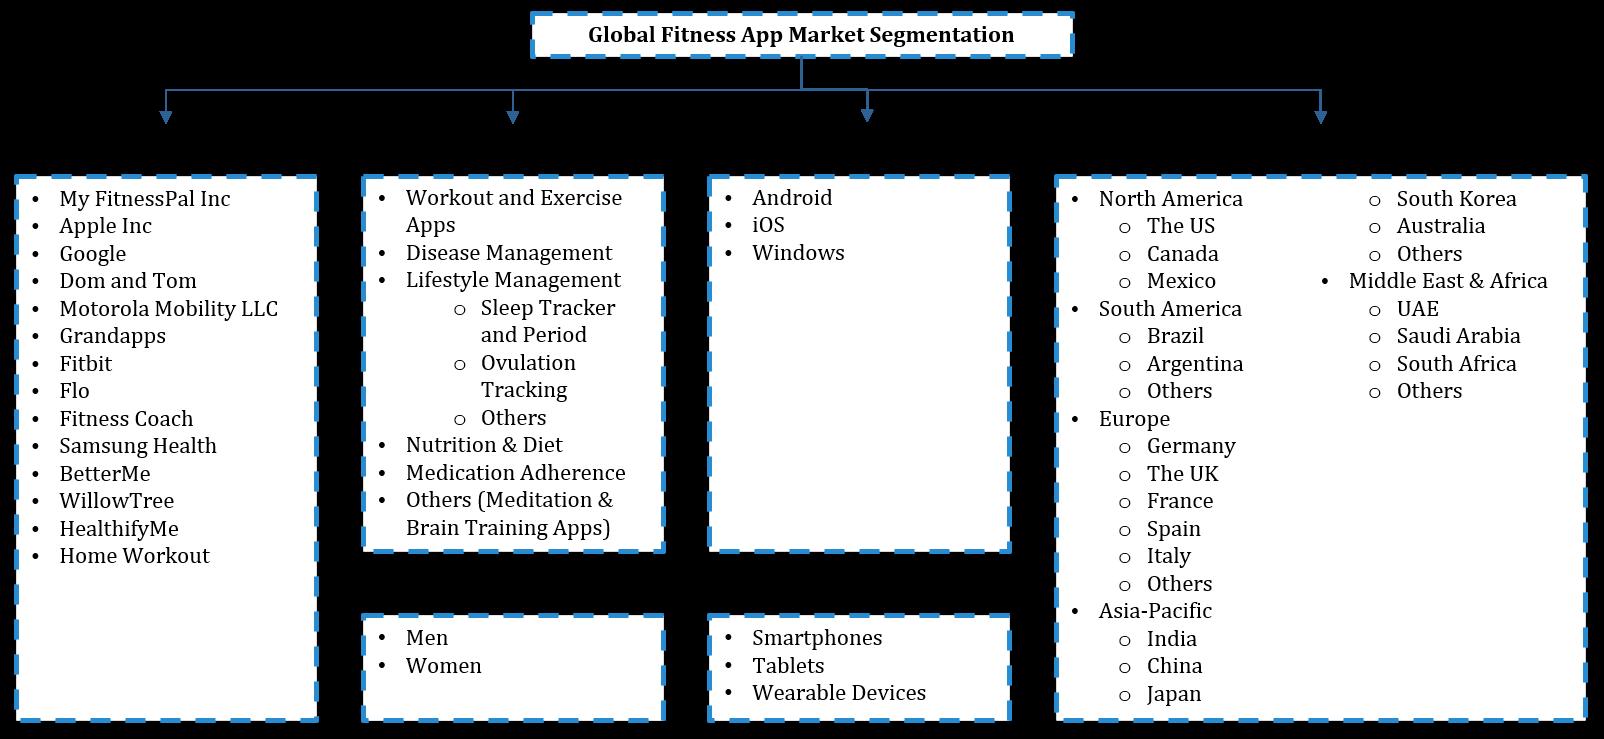 Global Fitness App Market Segmentation